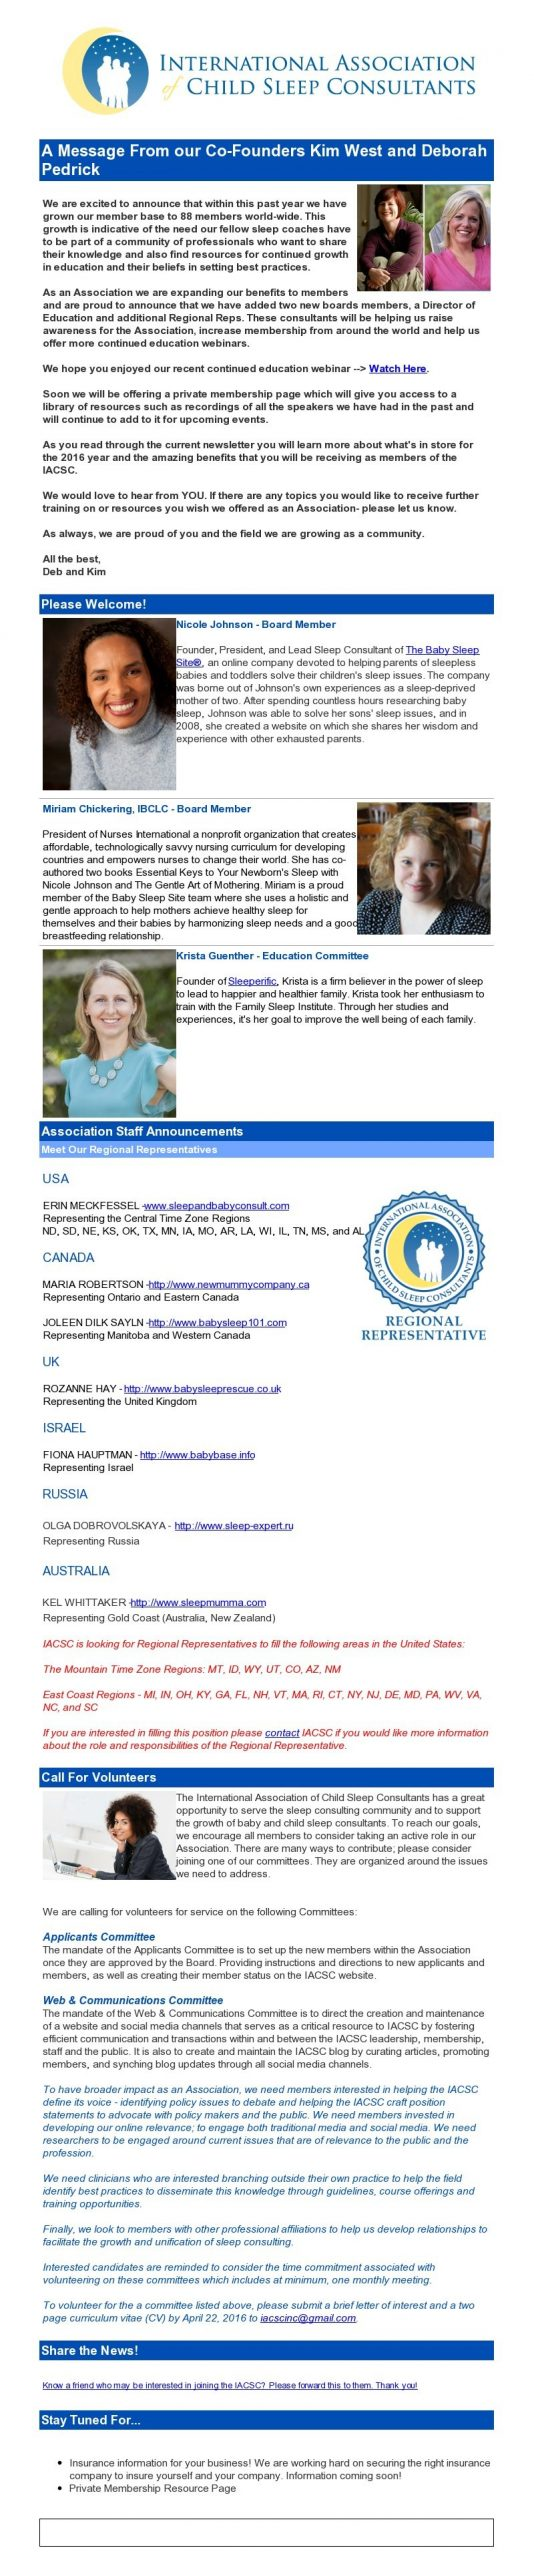 Member Newsletters | International Association Of Child Content Calendar For Member Newsletters